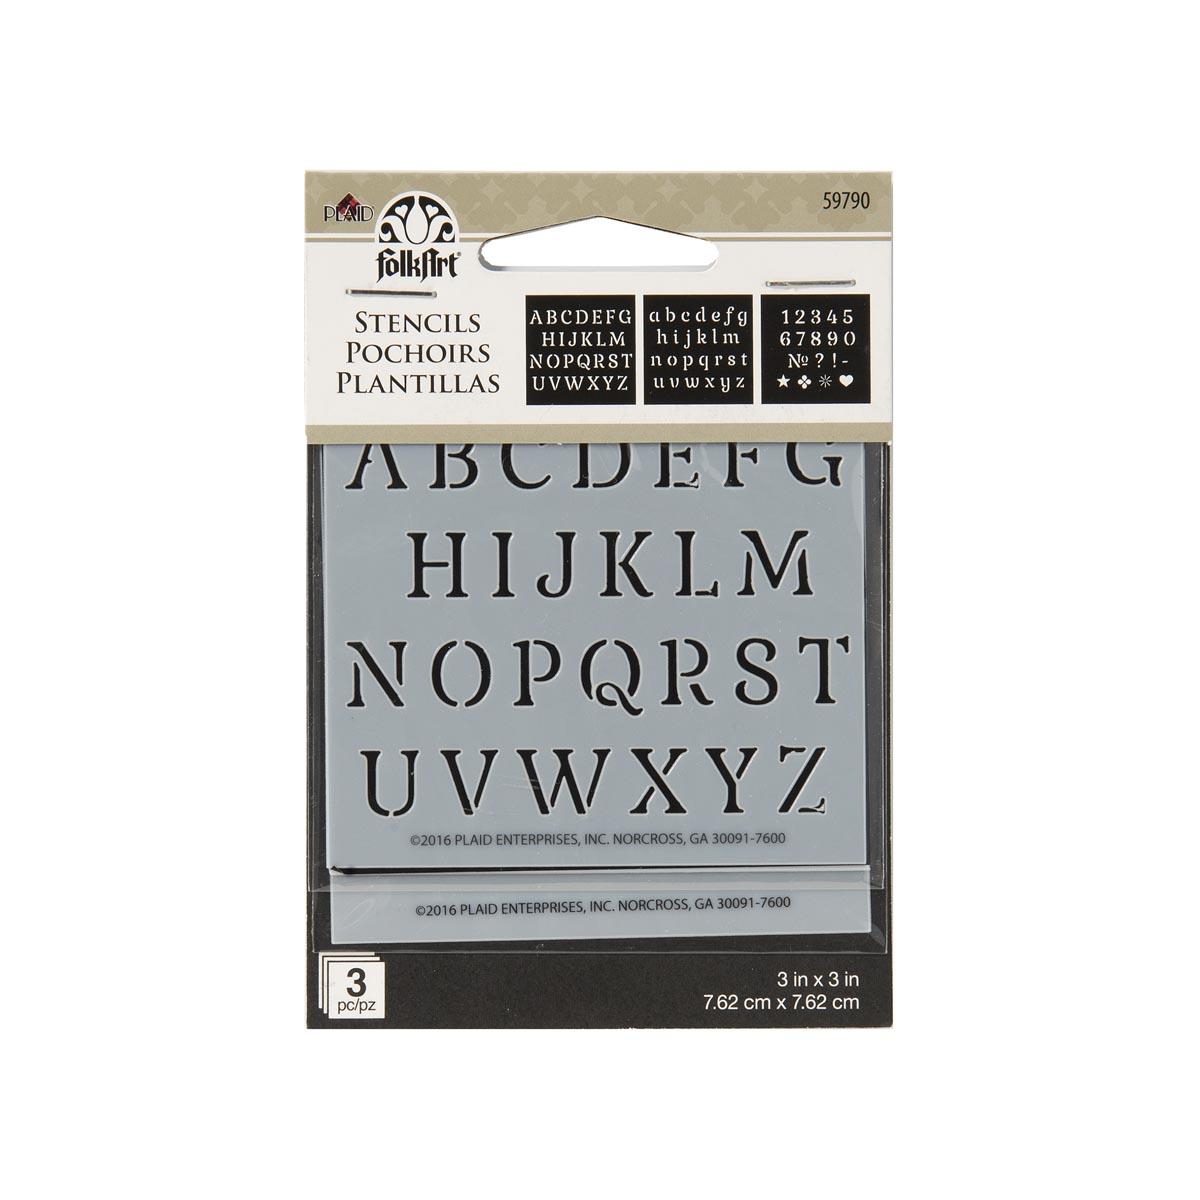 FolkArt ® Painting Stencils - Mini - Alphabet - 59790